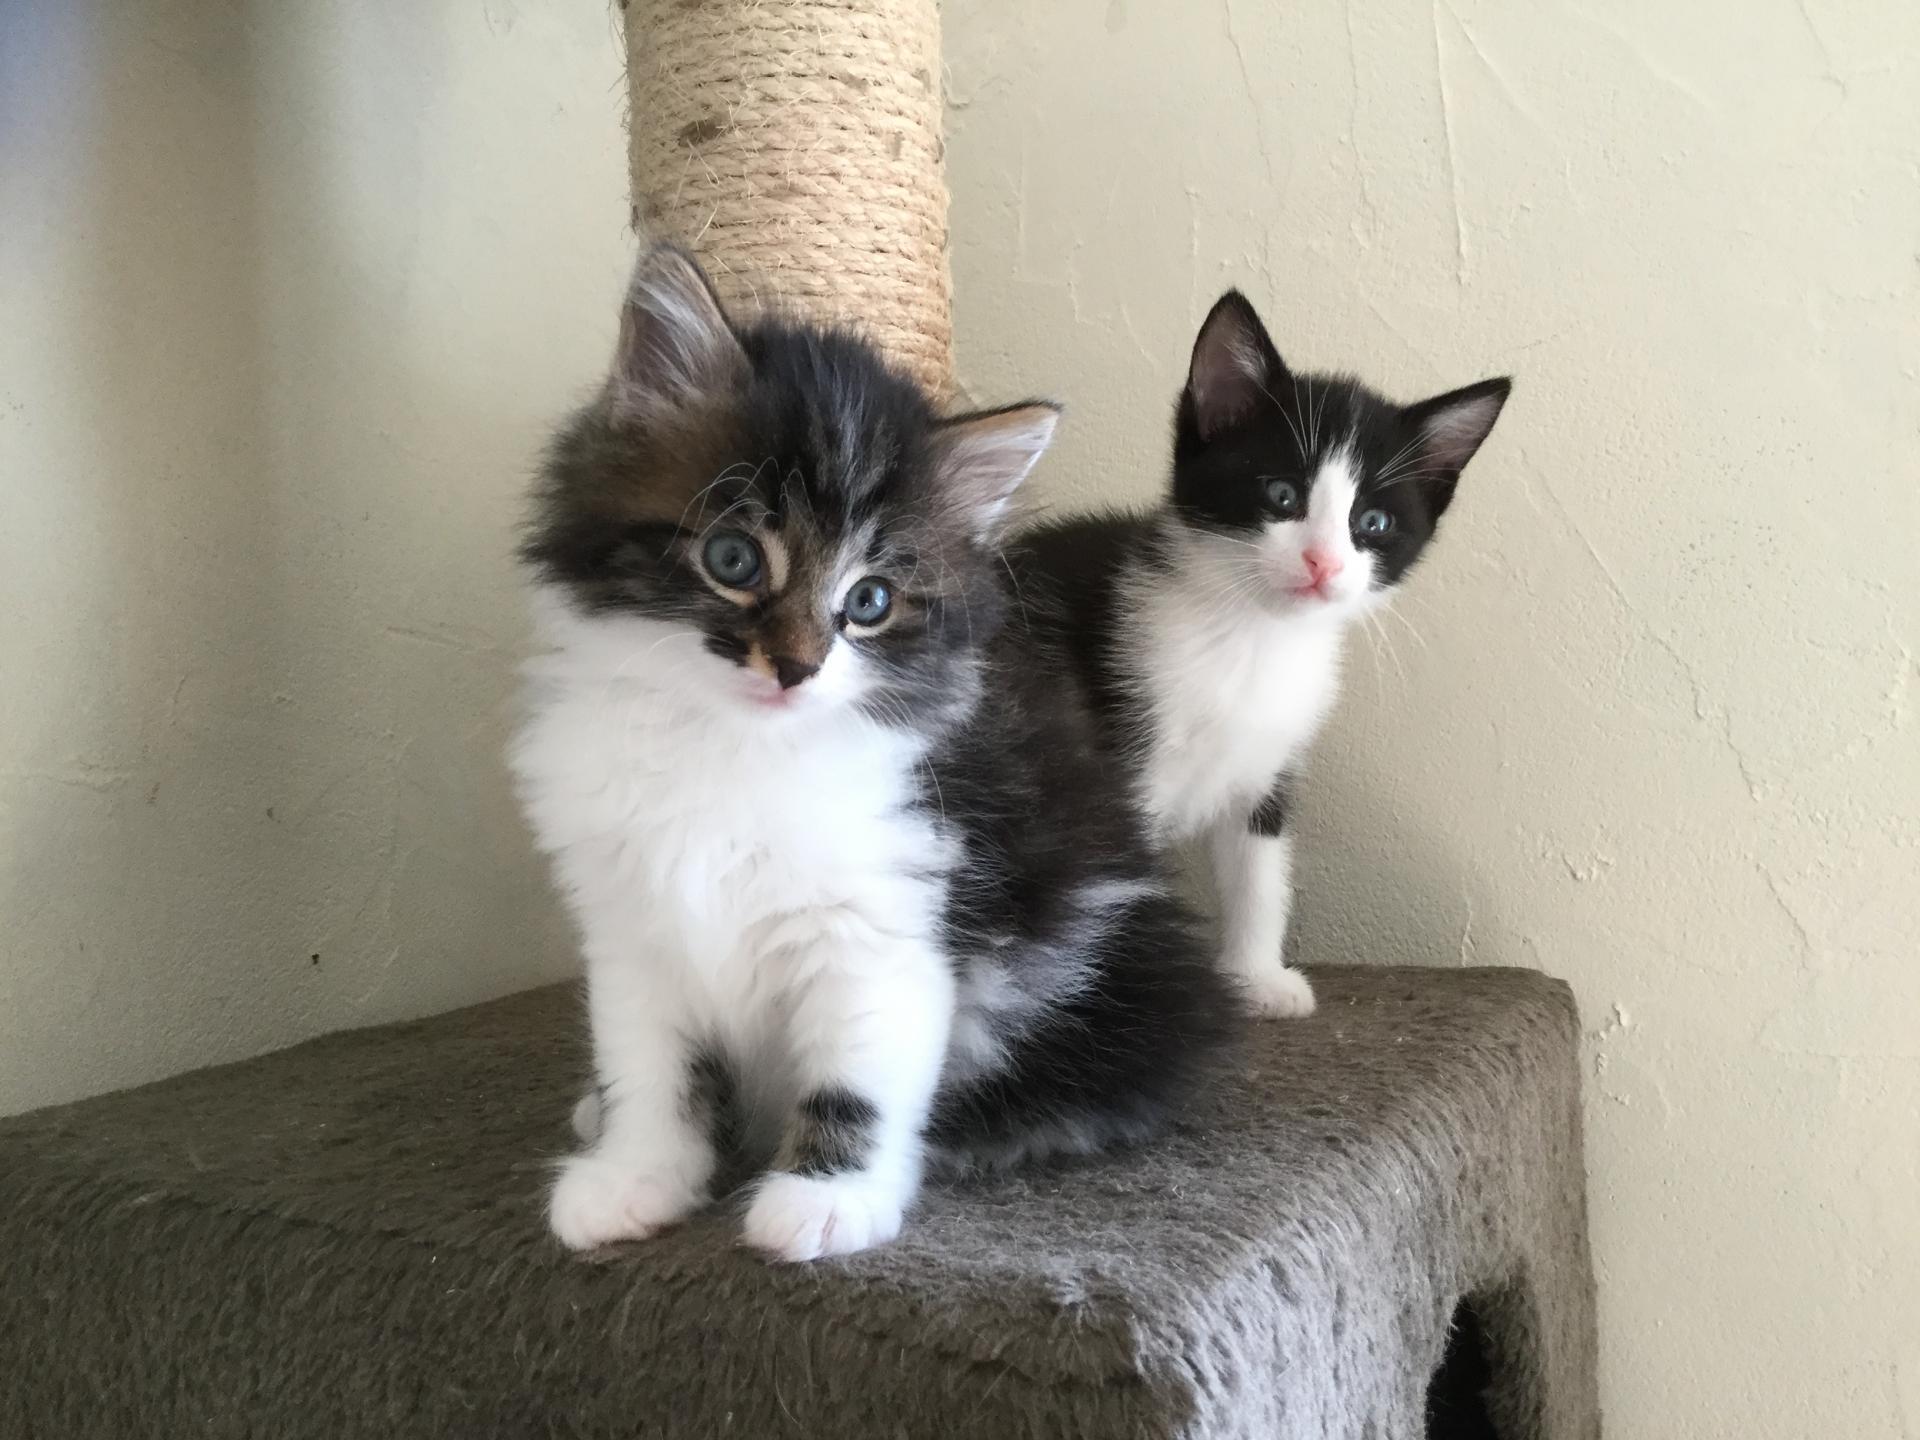 OMER - M - Née le 13/07/2018 - Adopté en Octobre 2018